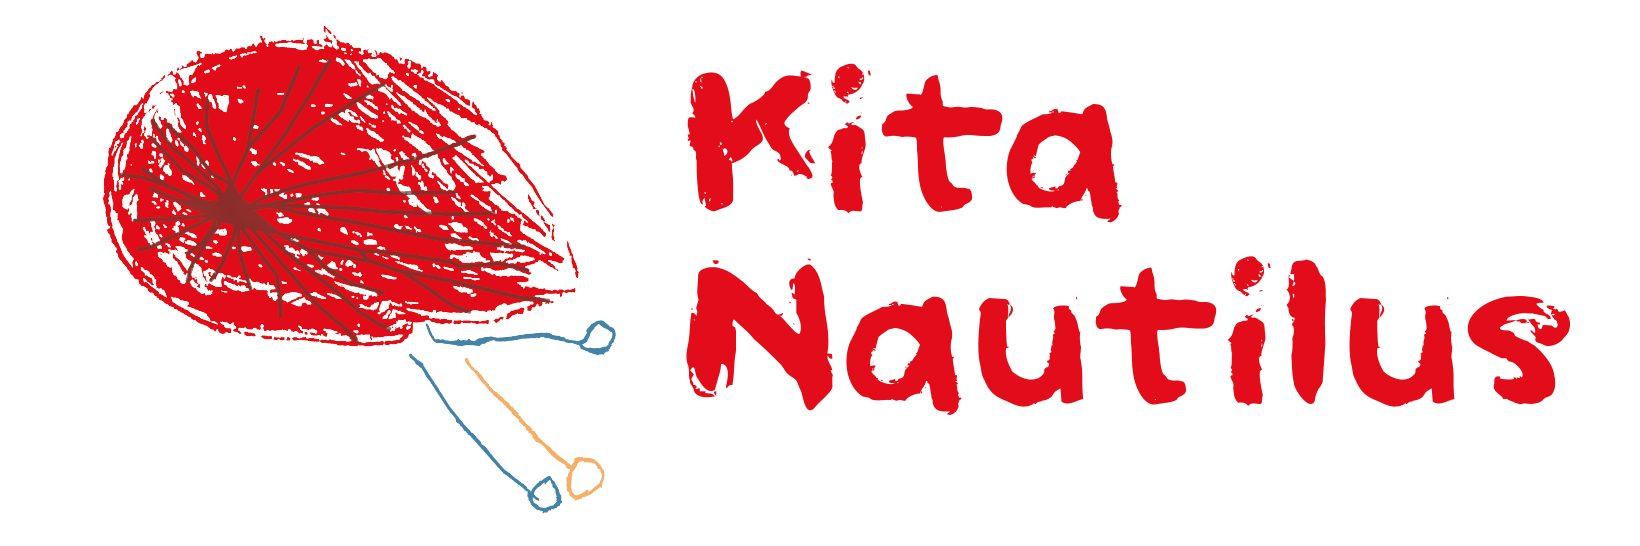 KITA NAUTILUS